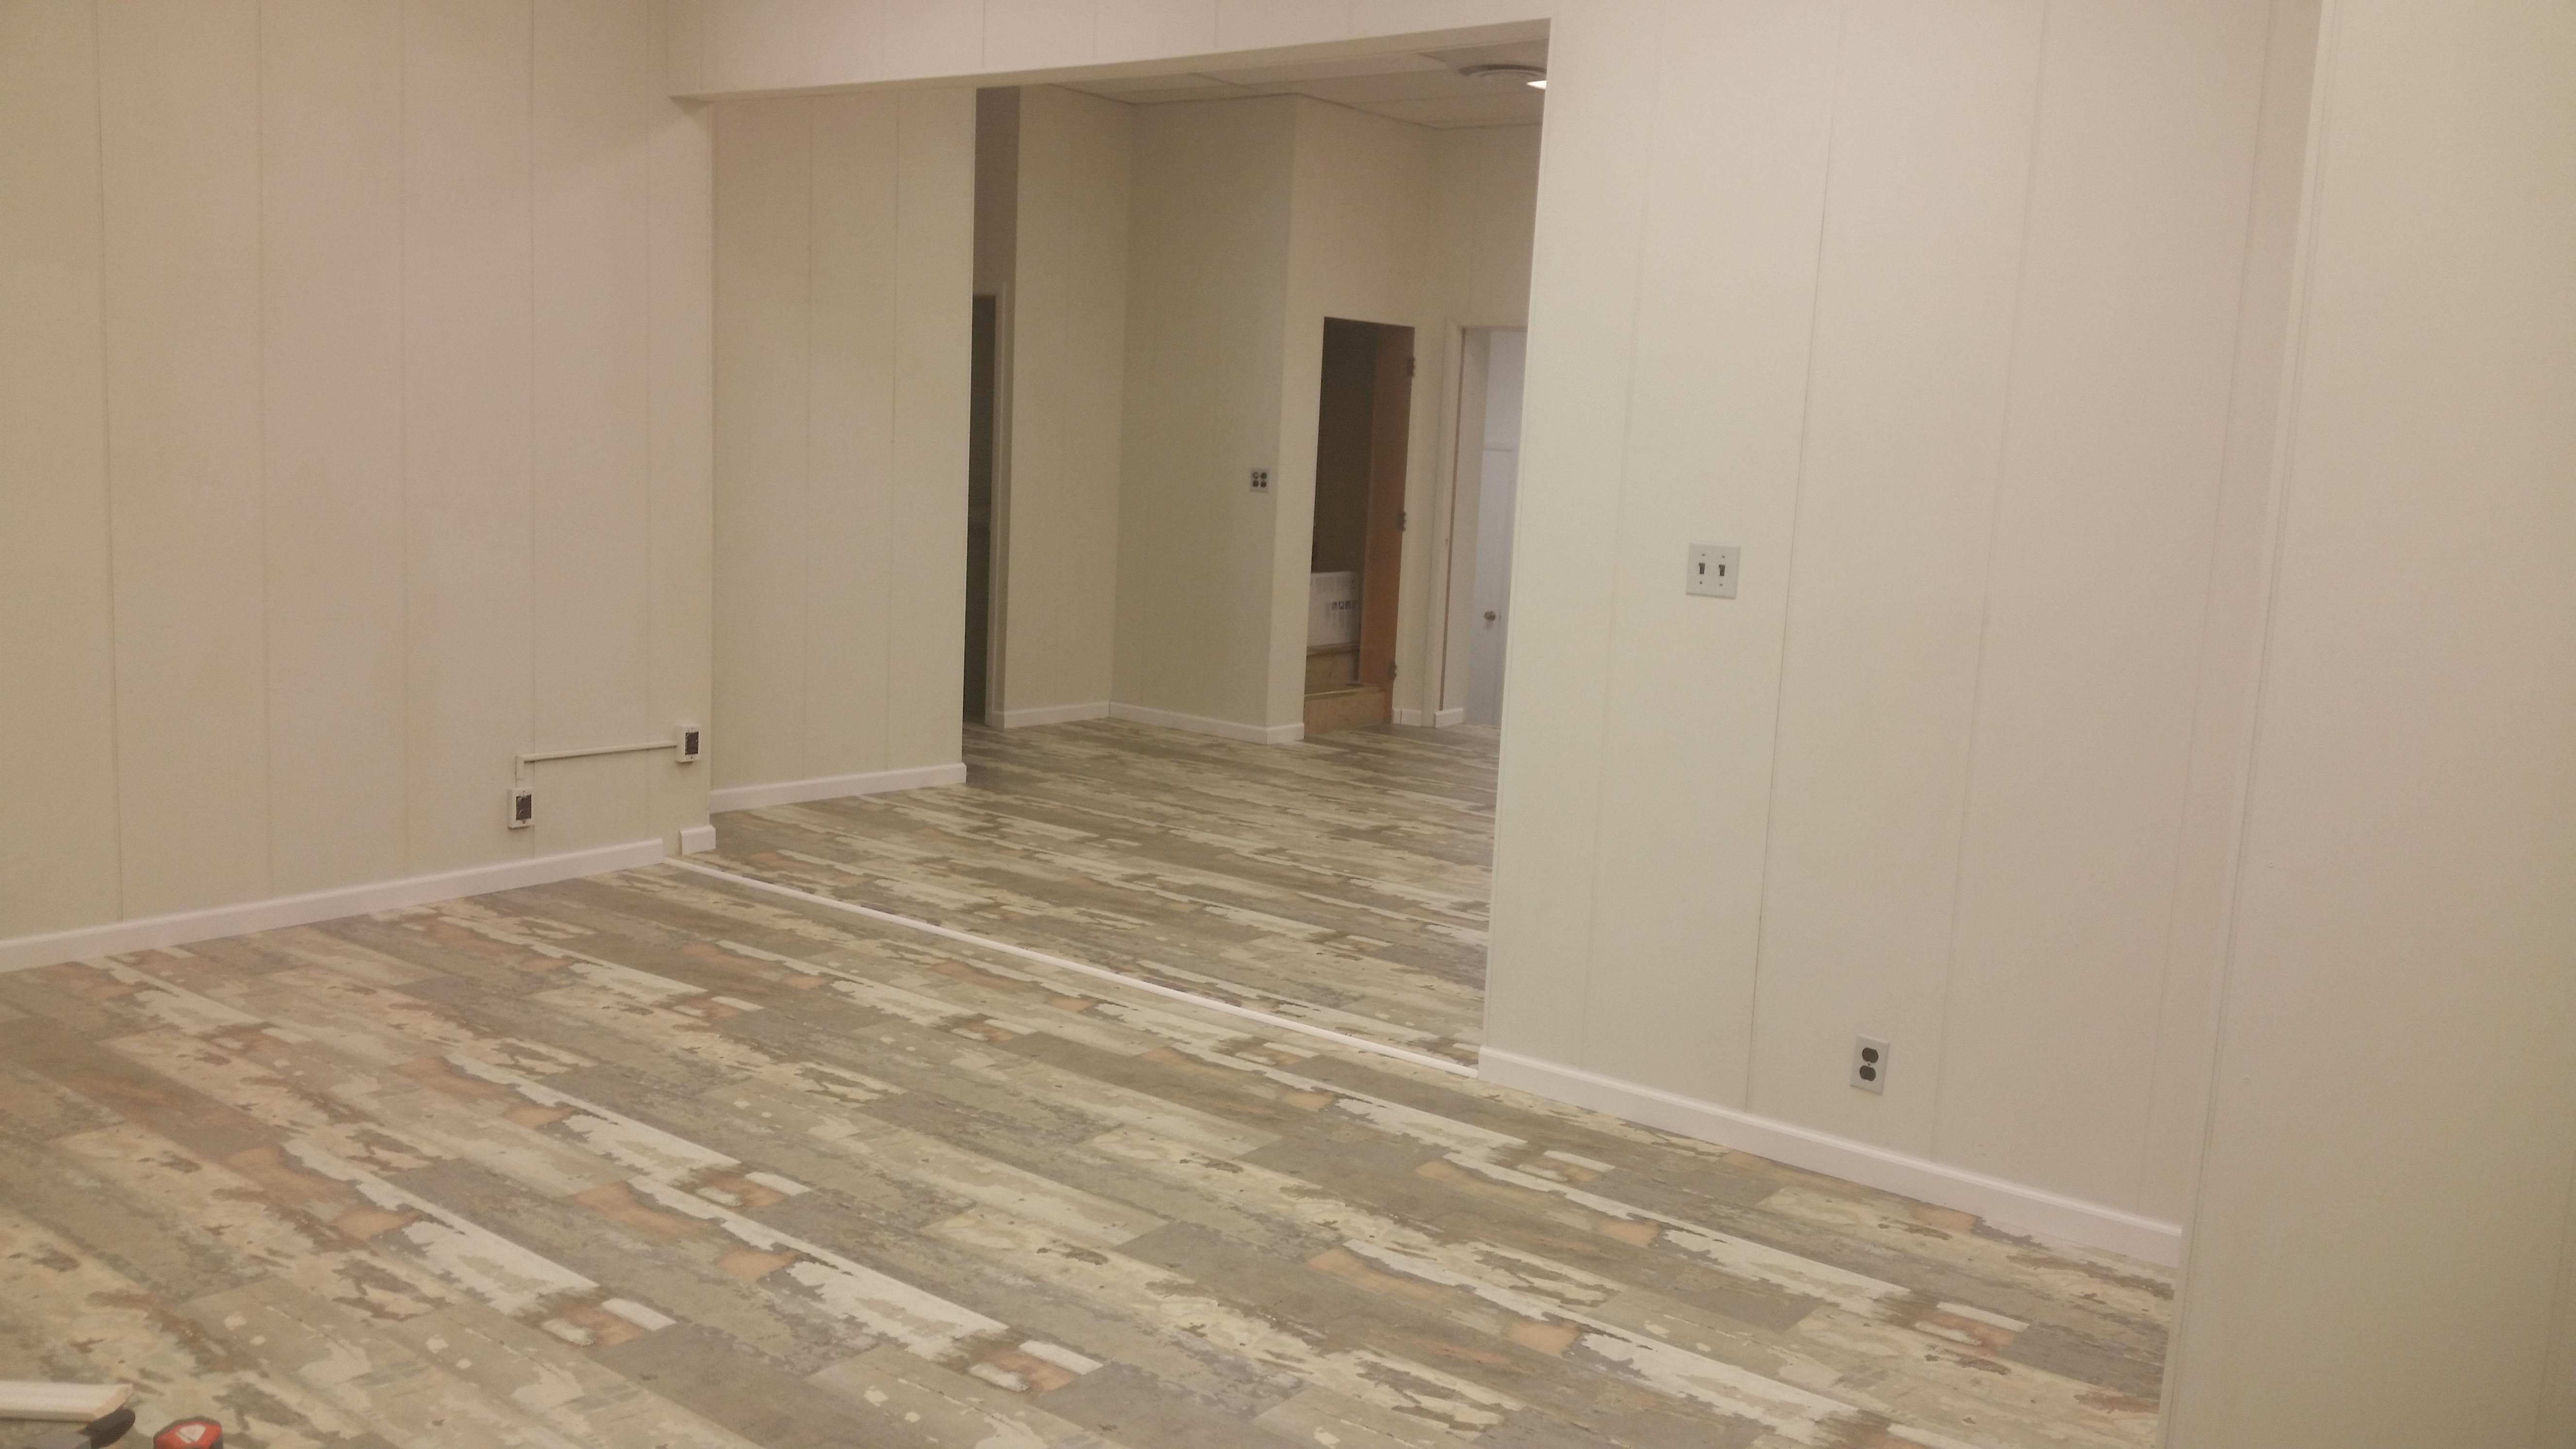 Floor installers nj carpet vidalondon for Wood floor installation nj